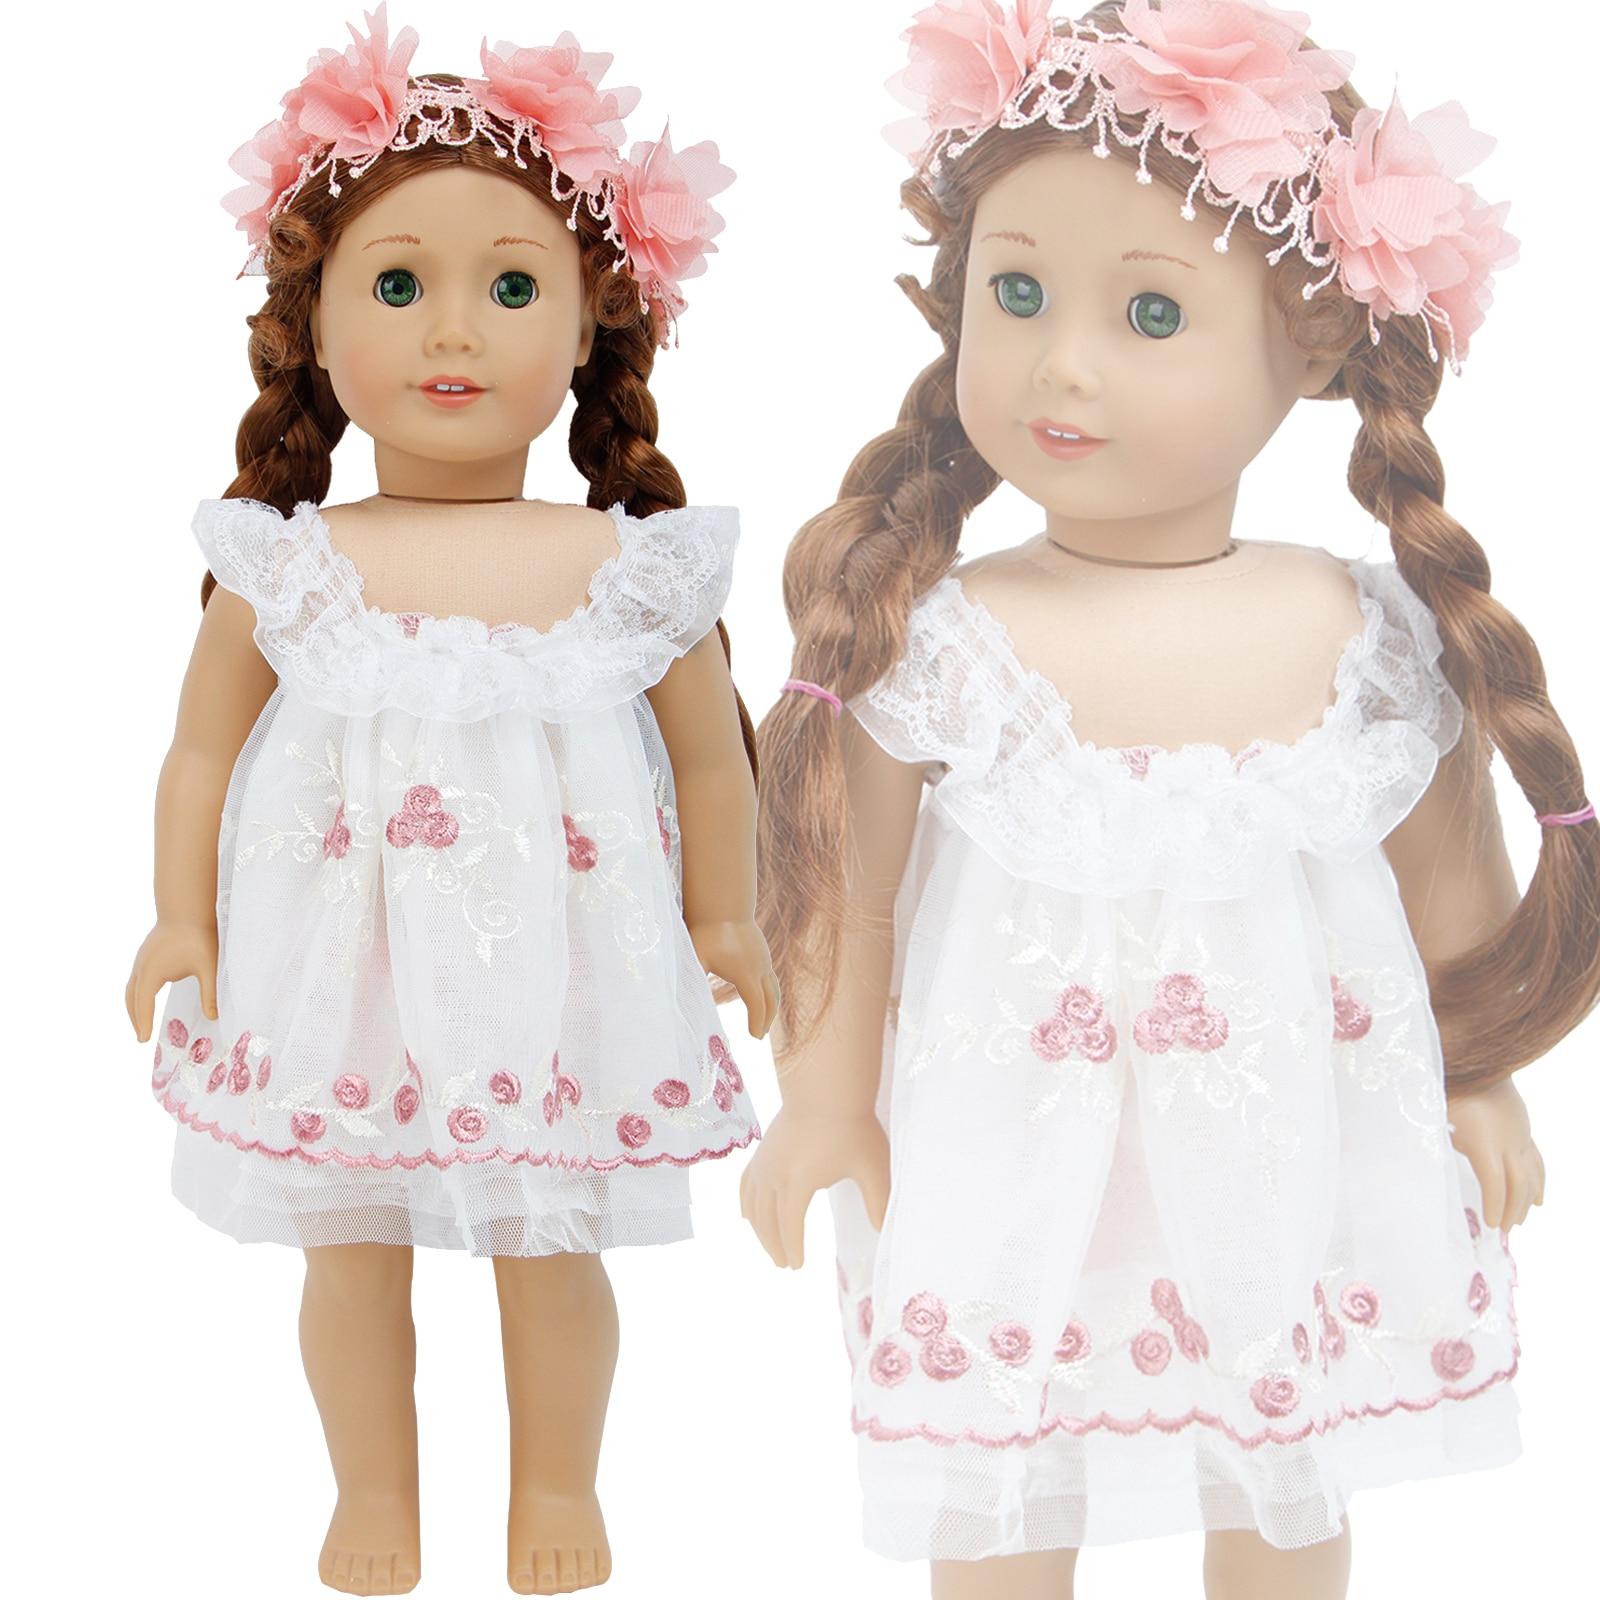 "Hot Pink Fleece Hoodie 18/"" doll clothes fits American Girl dolls Handmade"